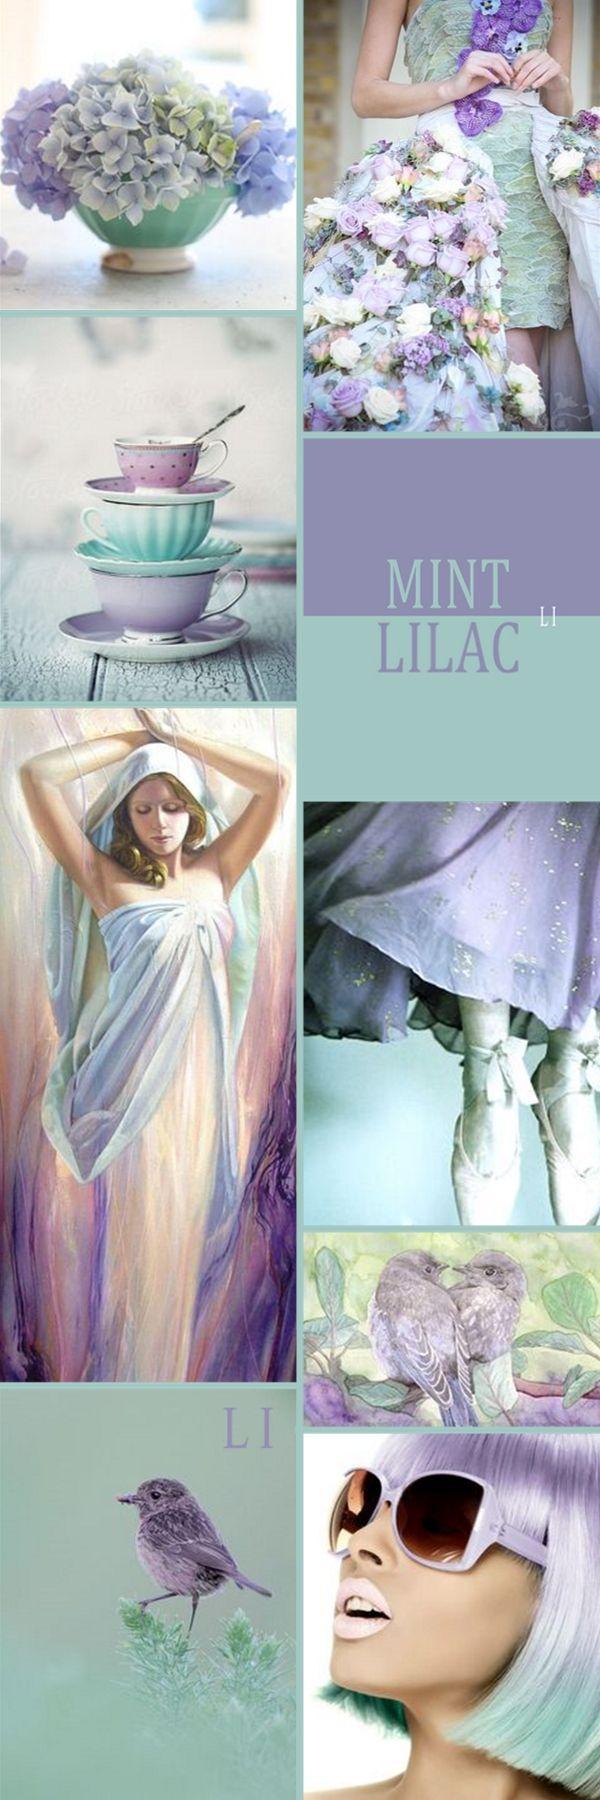 lu's inspiration